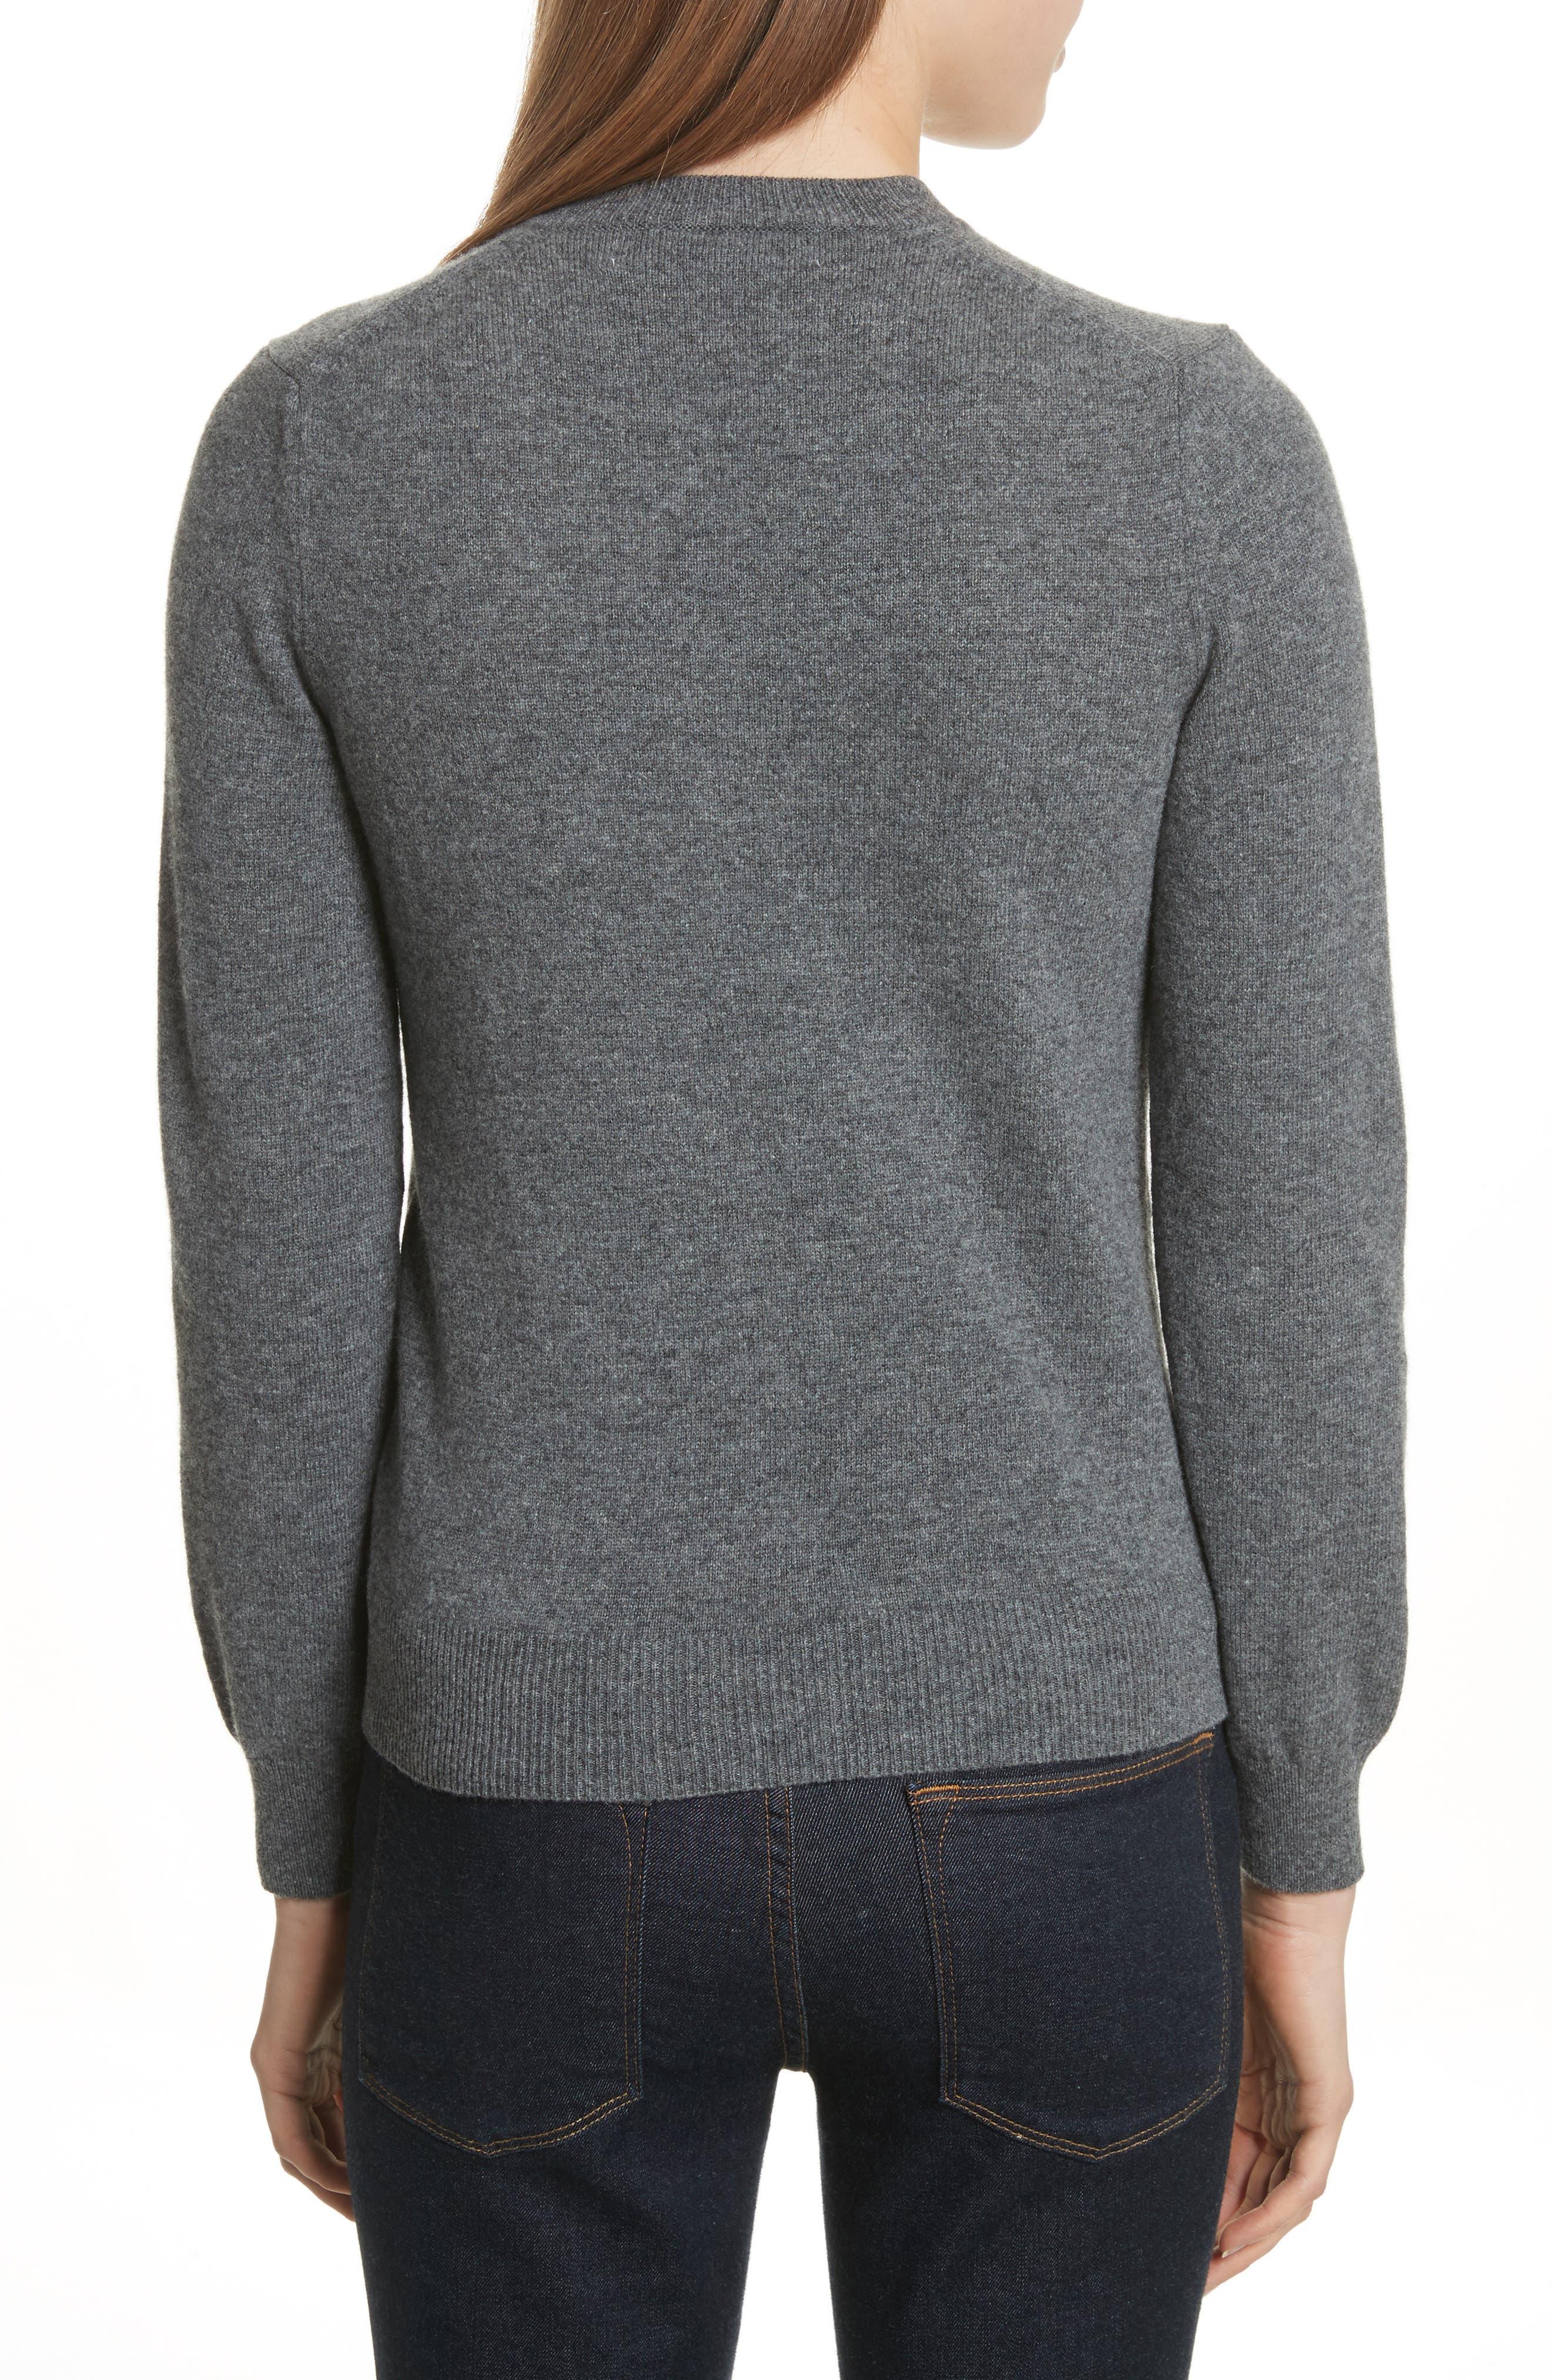 Comme des Garçons PLAY Wool V-Neck Sweater,                             Alternate thumbnail 2, color,                             Grey